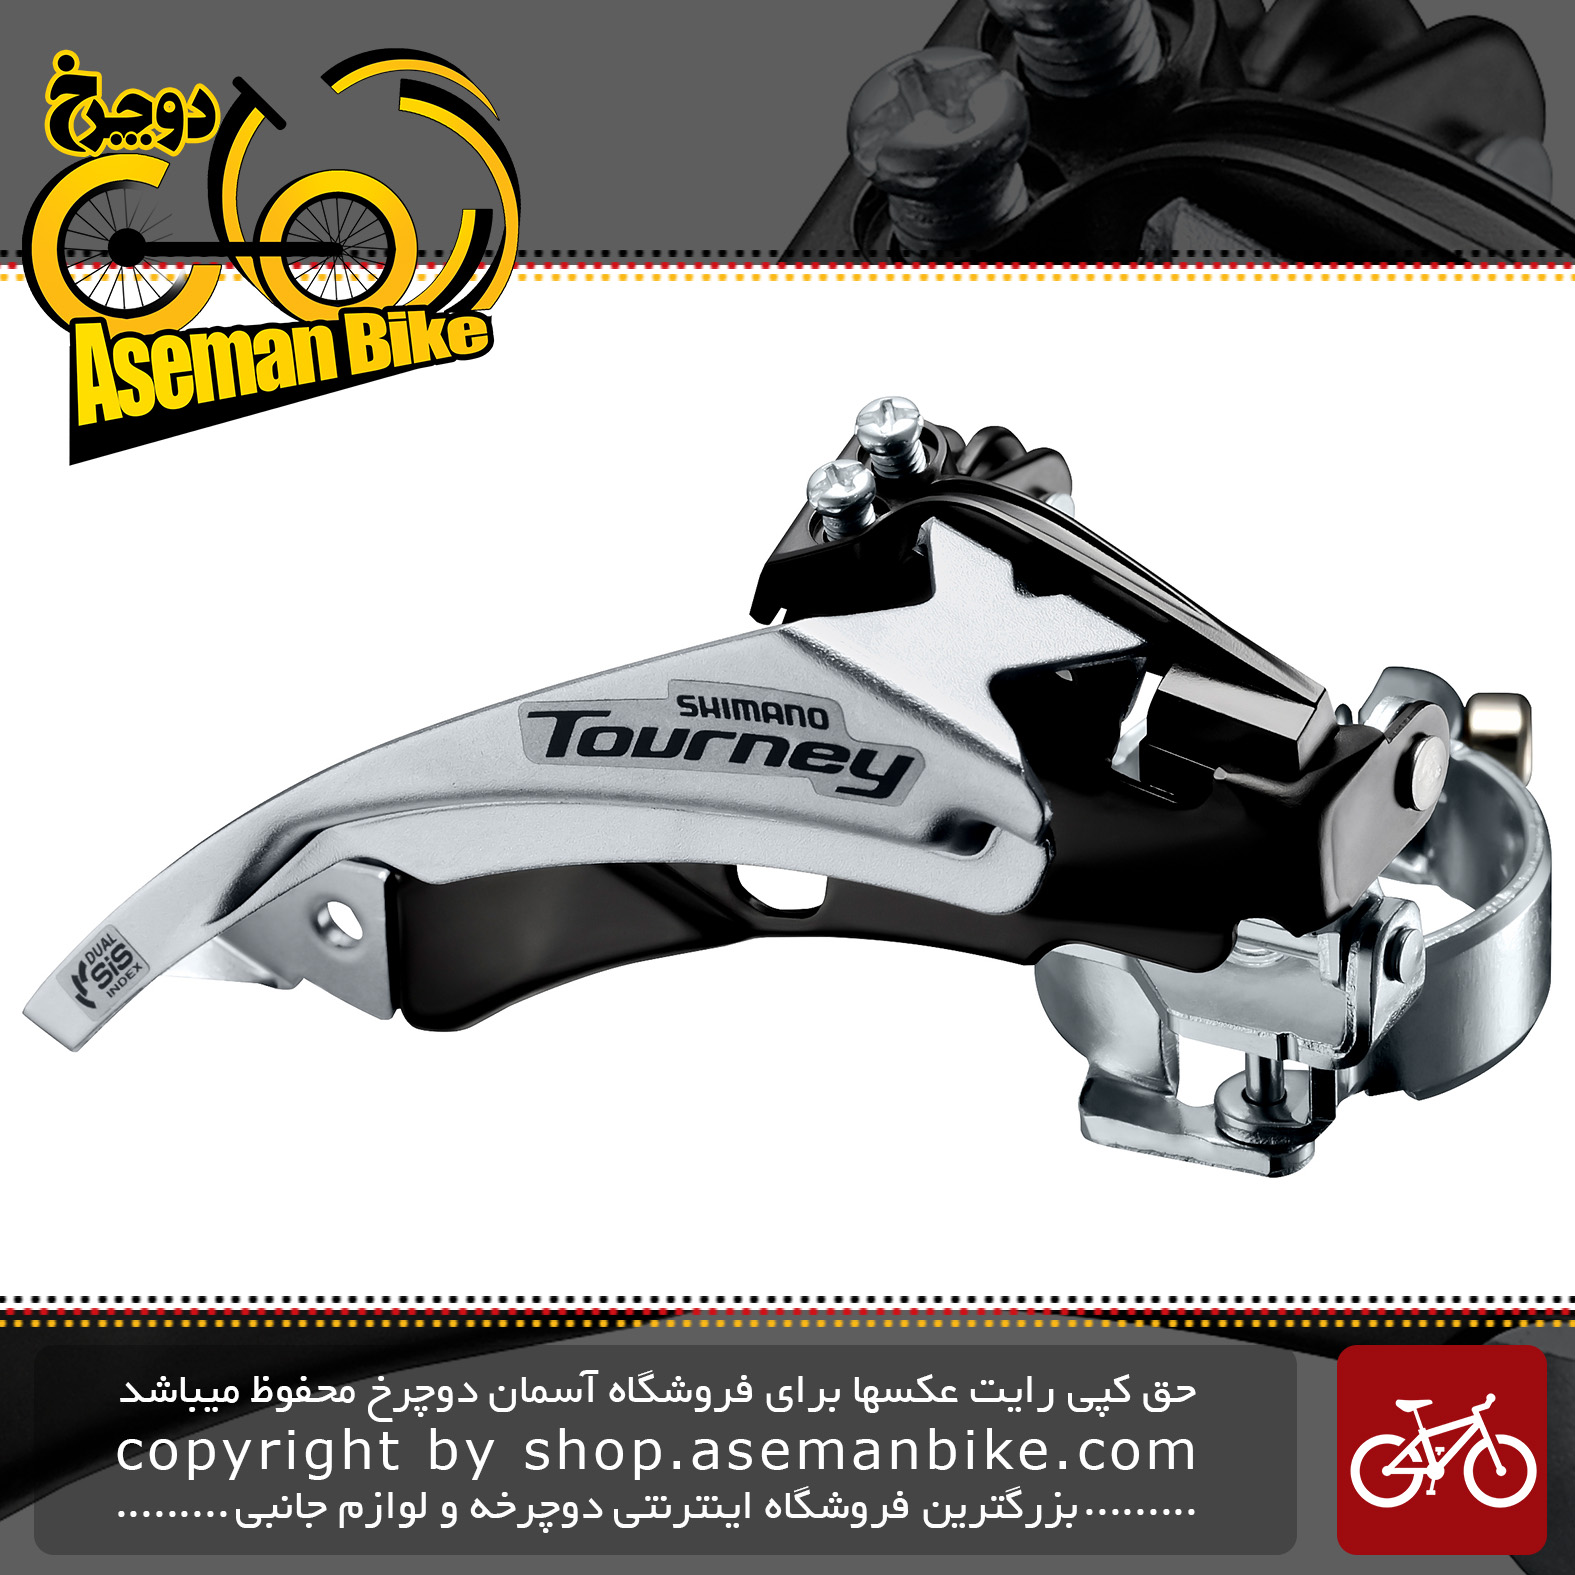 طبق عوض کن دوچرخه شیمانو تورنی Shimano TOURNEY FD-TY500-TS6 TOP SWING Front Derailleur (3x7-6-speed)